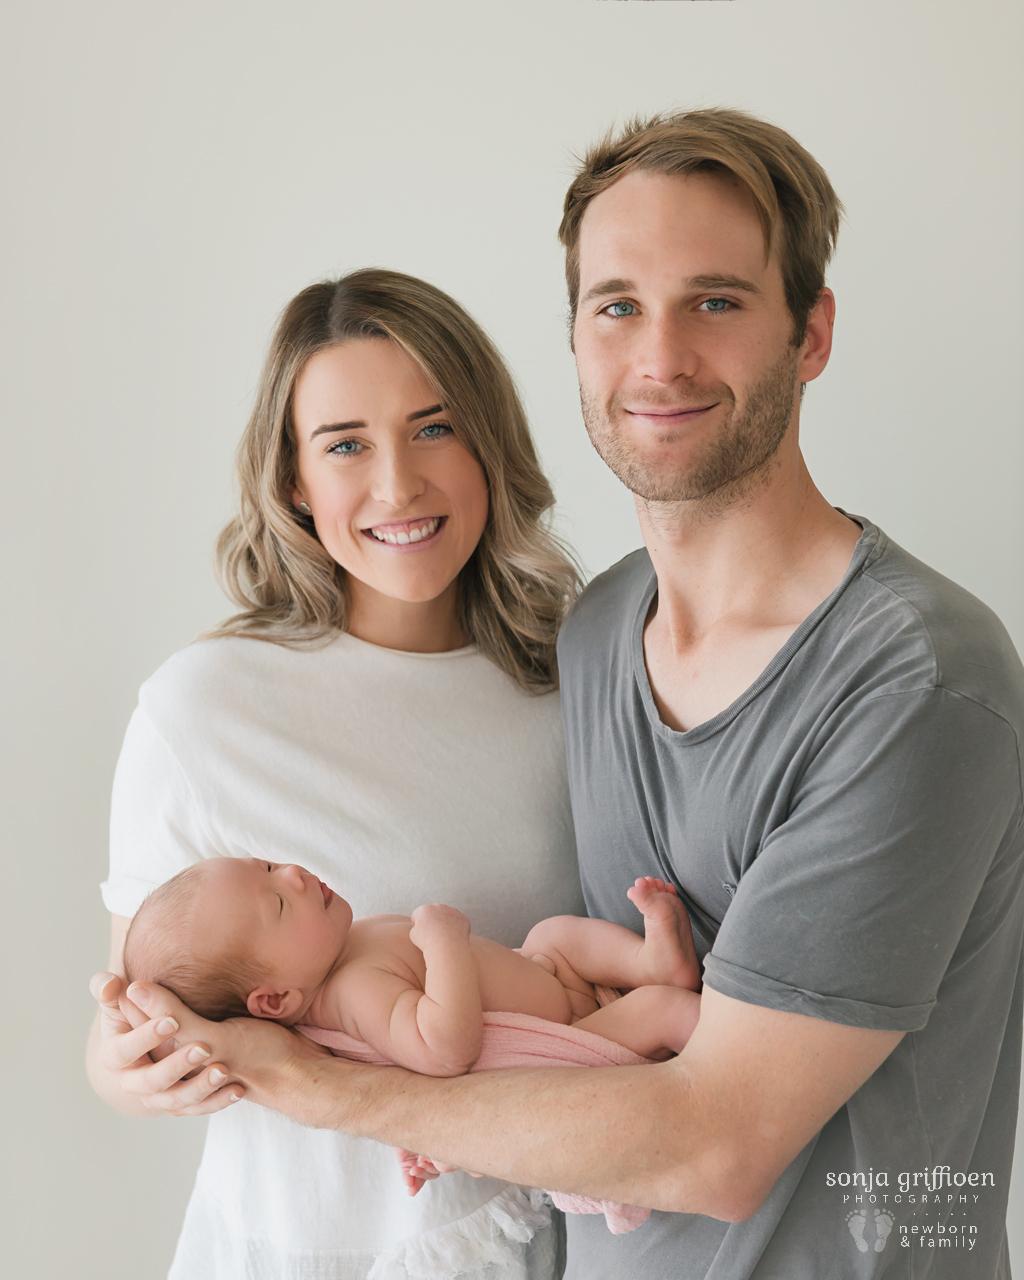 Matilda-Newborn-Brisbane-Newborn-Photographer-Sonja-Griffioen-17.jpg